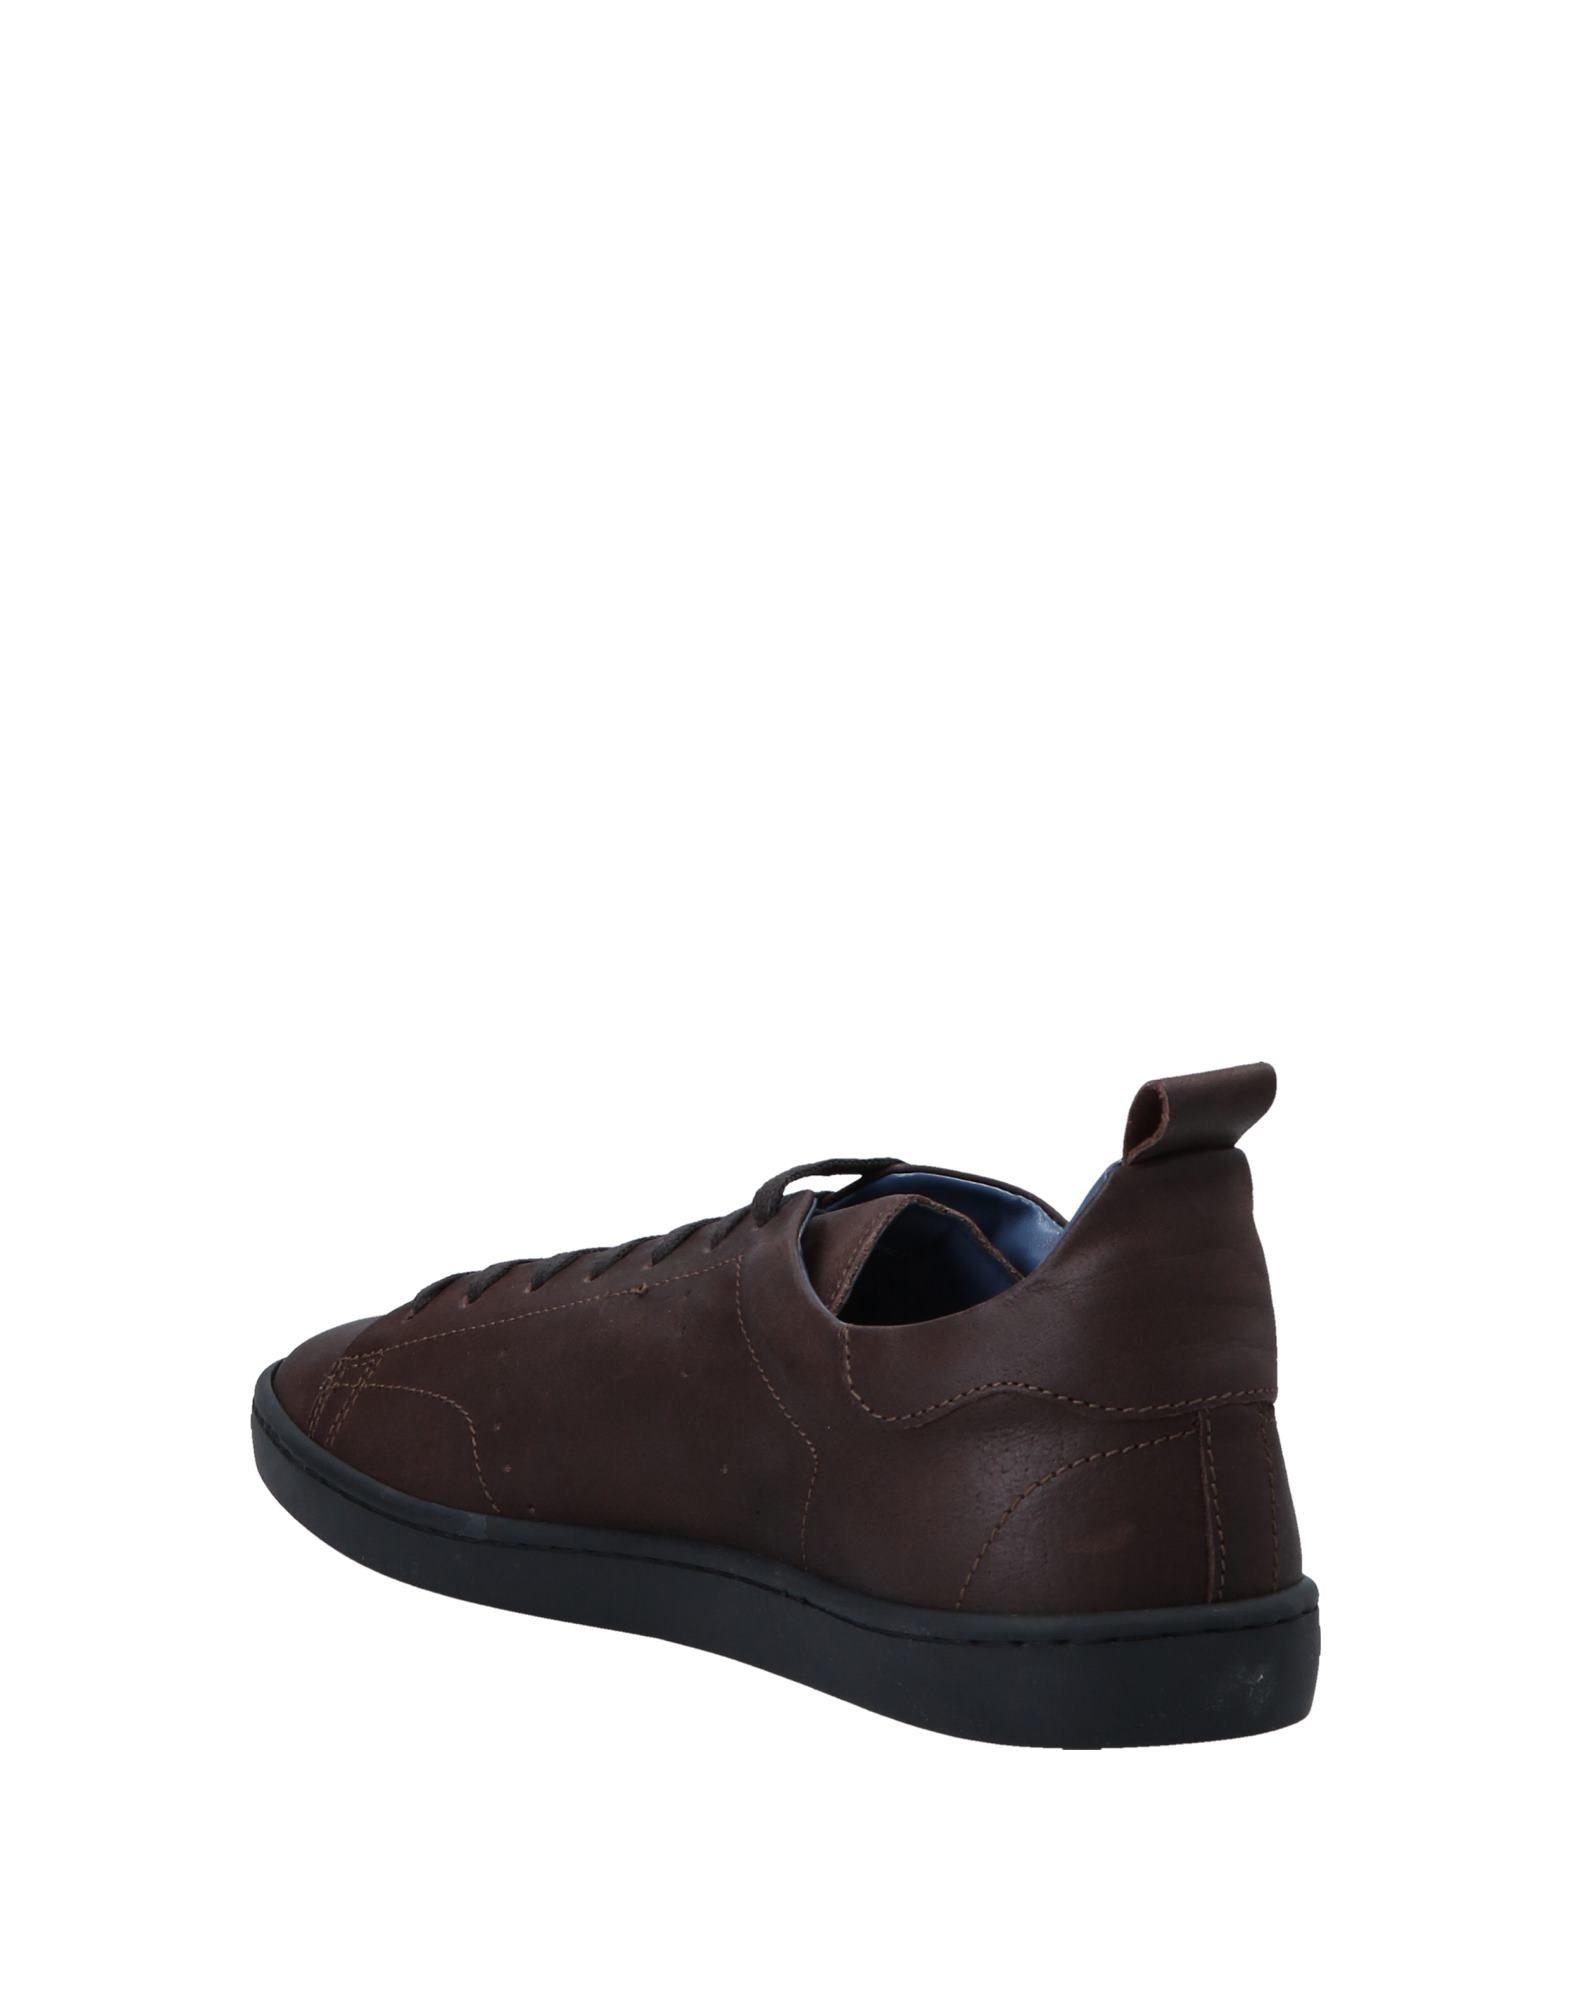 Antony Morato Sneakers Sneakers Sneakers - Men Antony Morato Sneakers online on  Australia - 11548991KW fe2072